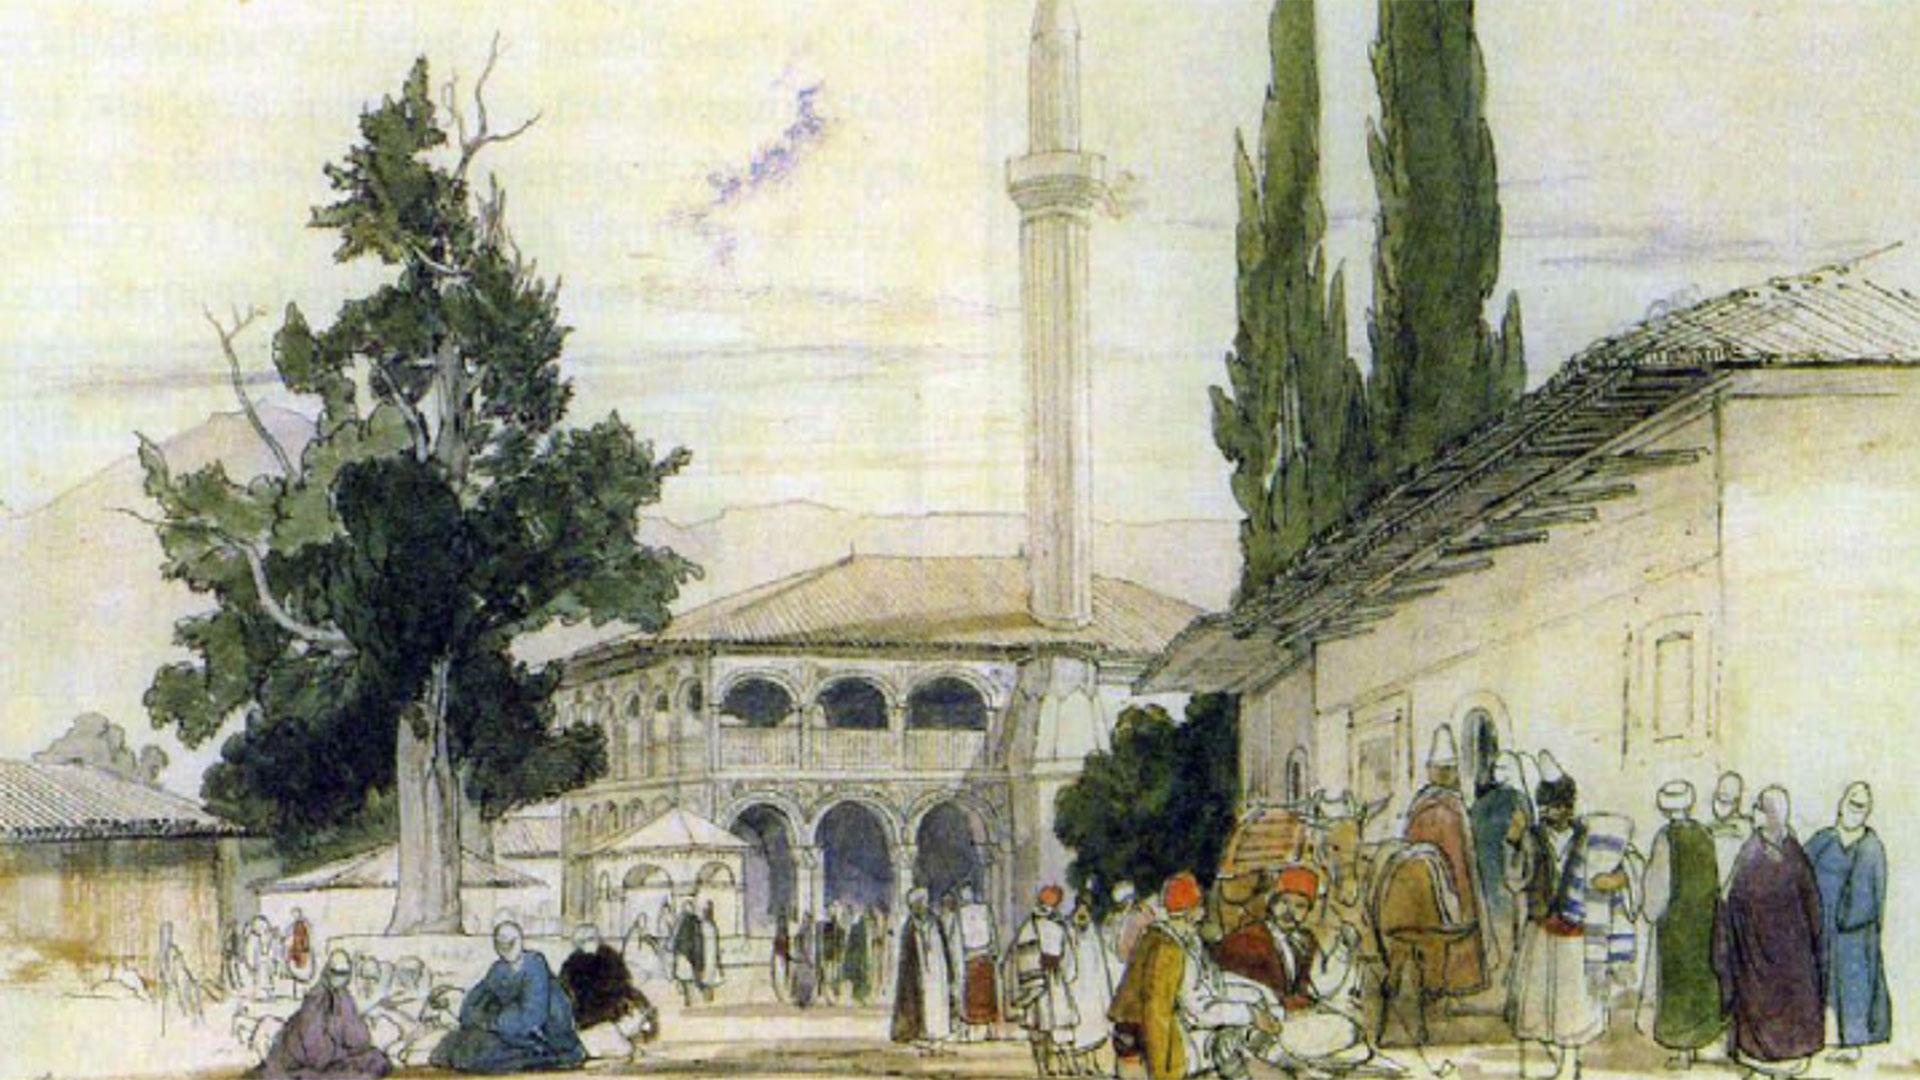 Ethem-Bey-Mosque–Lear-3